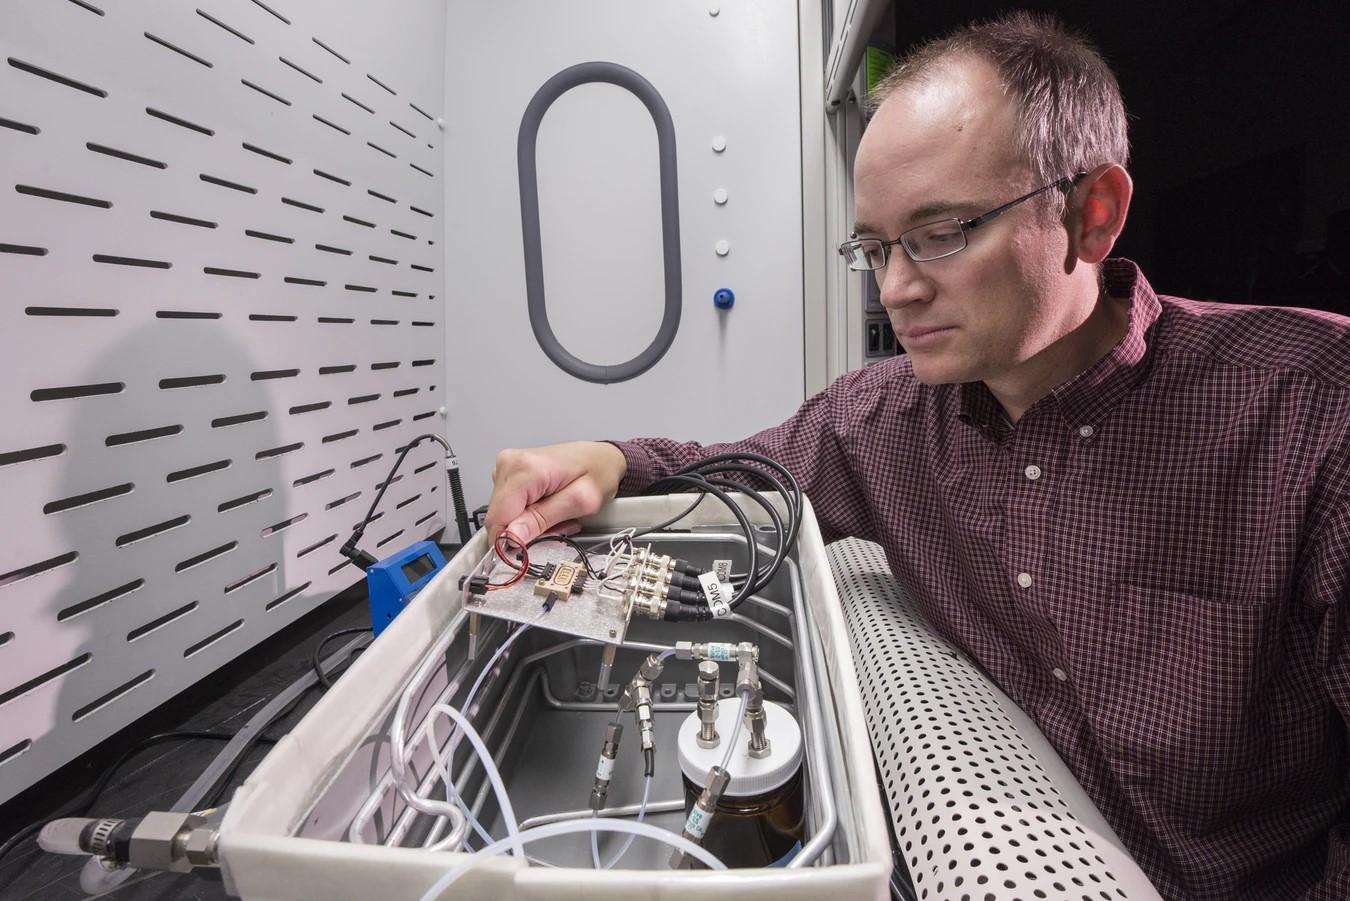 EMS Engineer working on sensors in prototype development